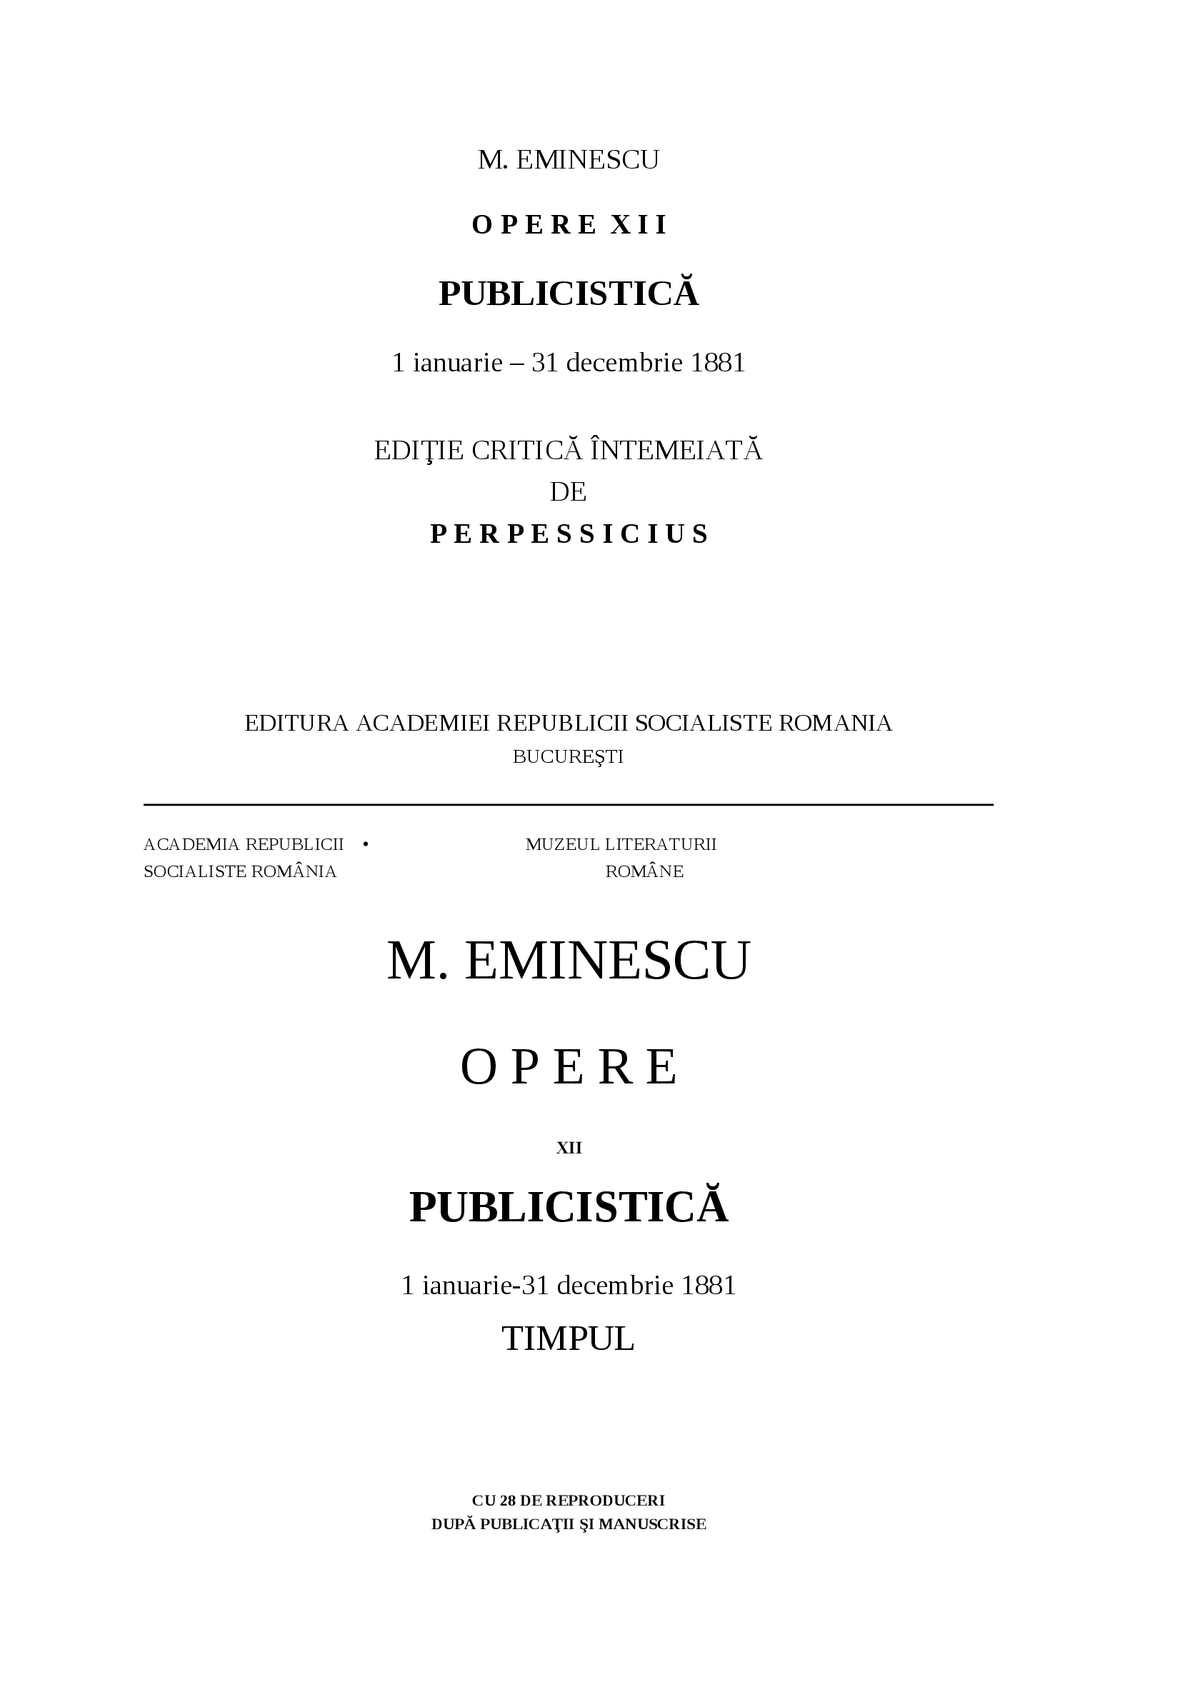 Calaméo - Mihai Eminescu, Opere XII